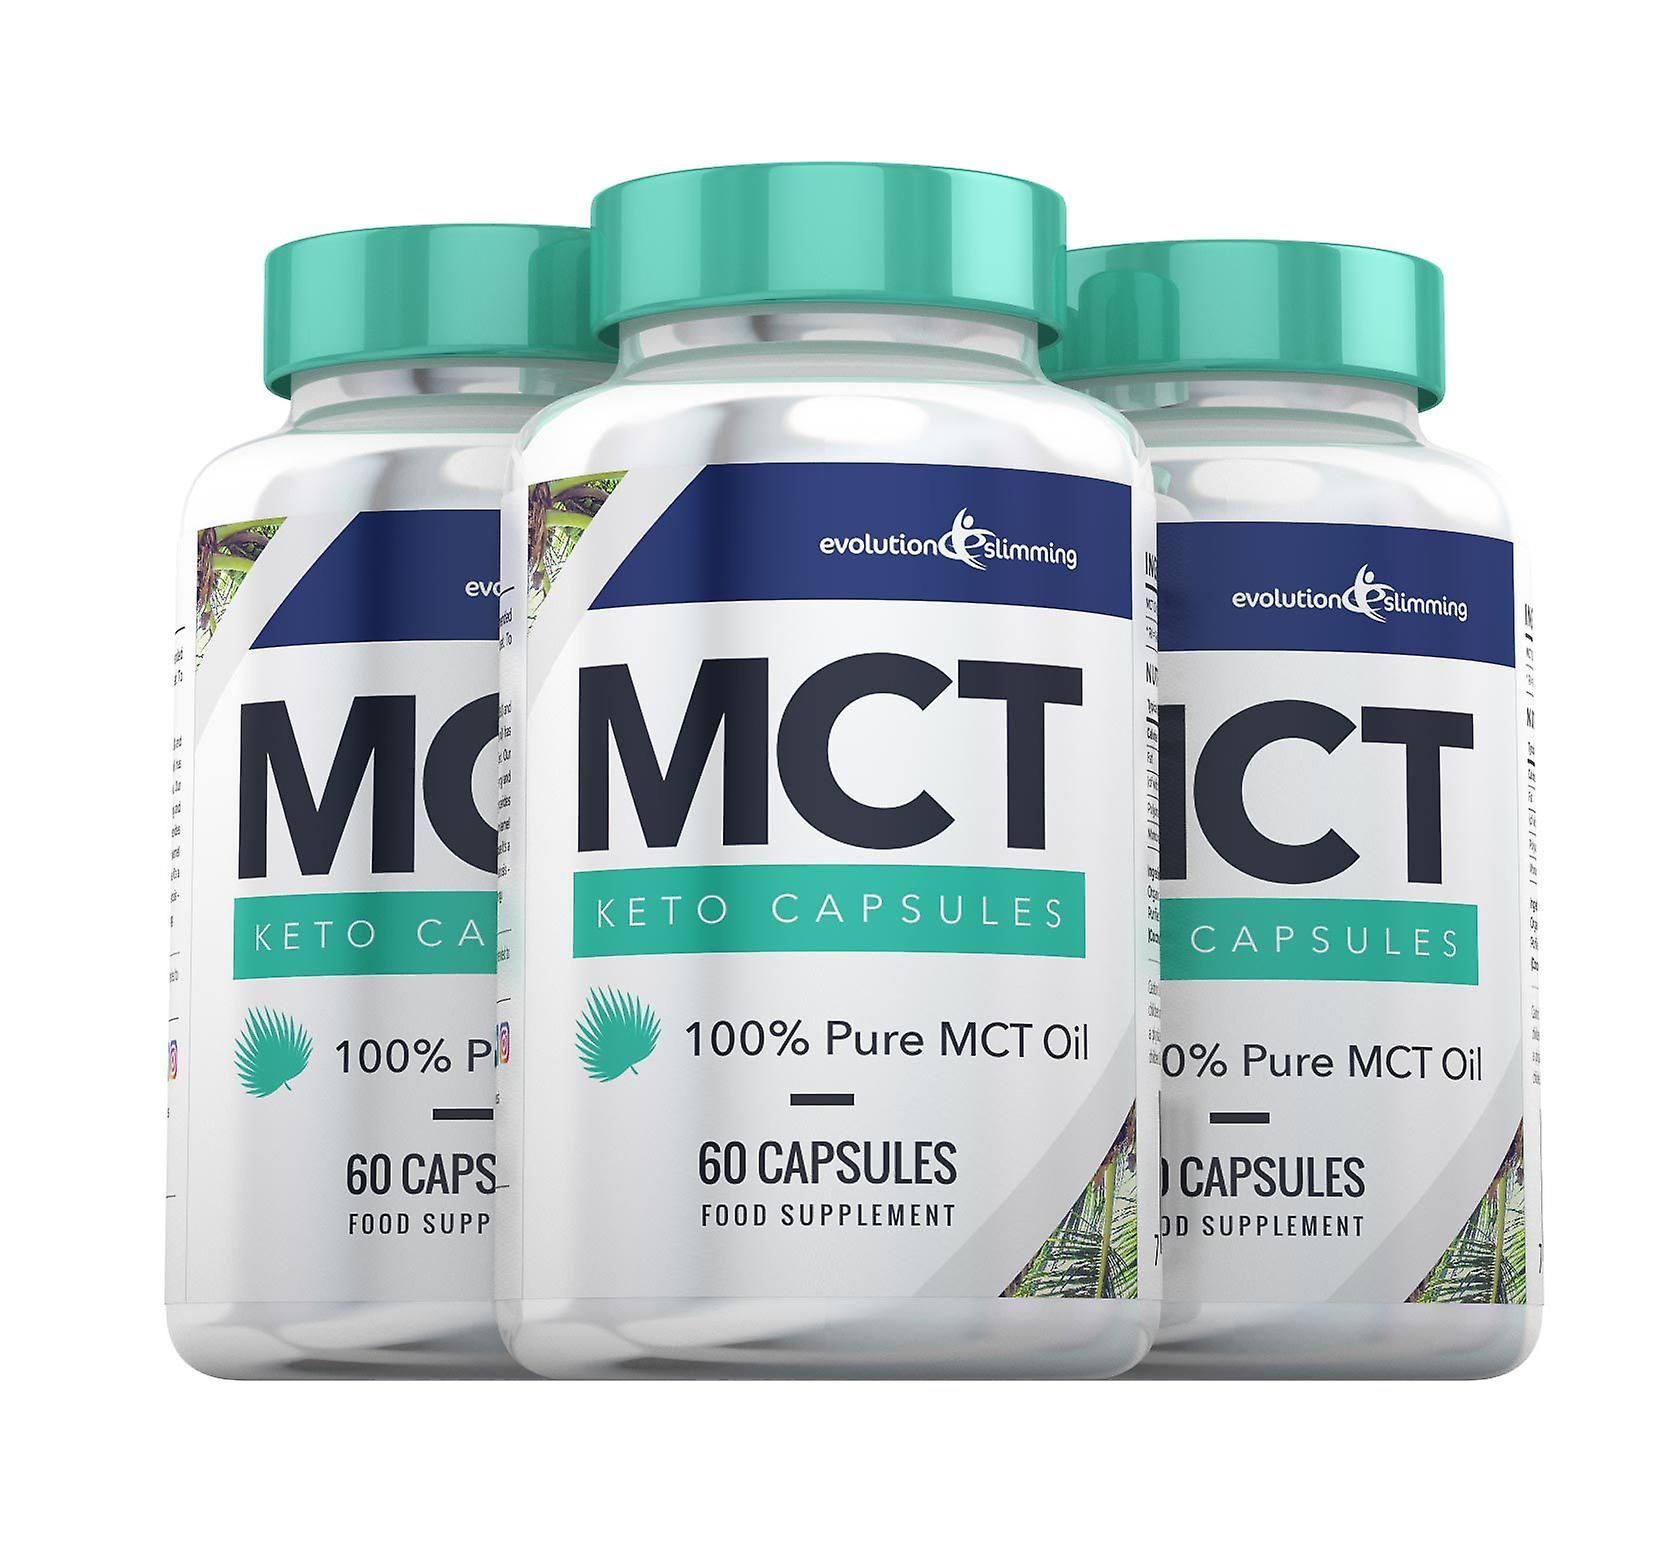 MCT Oil Keto Capsules 100% Pure MCT Oil - 180 Capsules - MCT Oil Capsules - Evolution Slimming